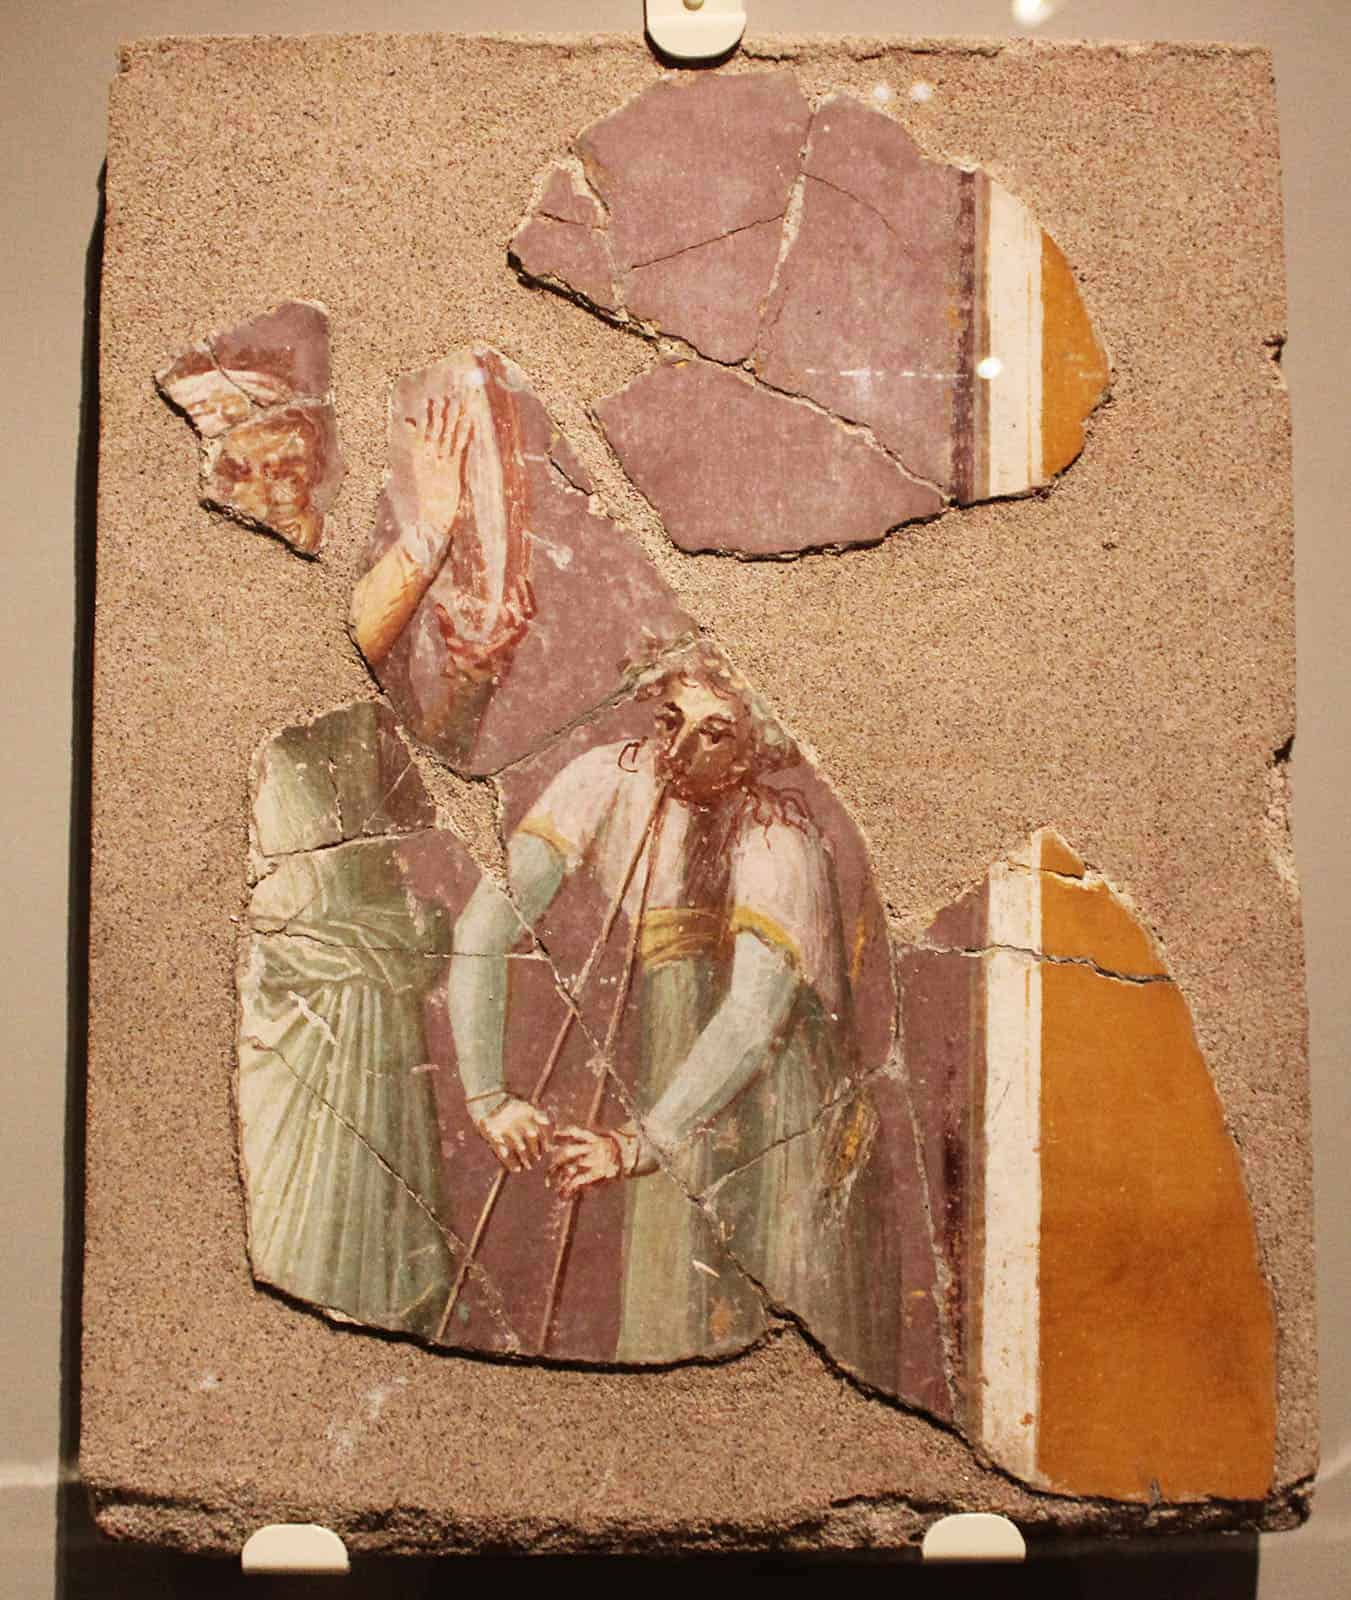 Pompeii Exhibition at the ROM in Toronto